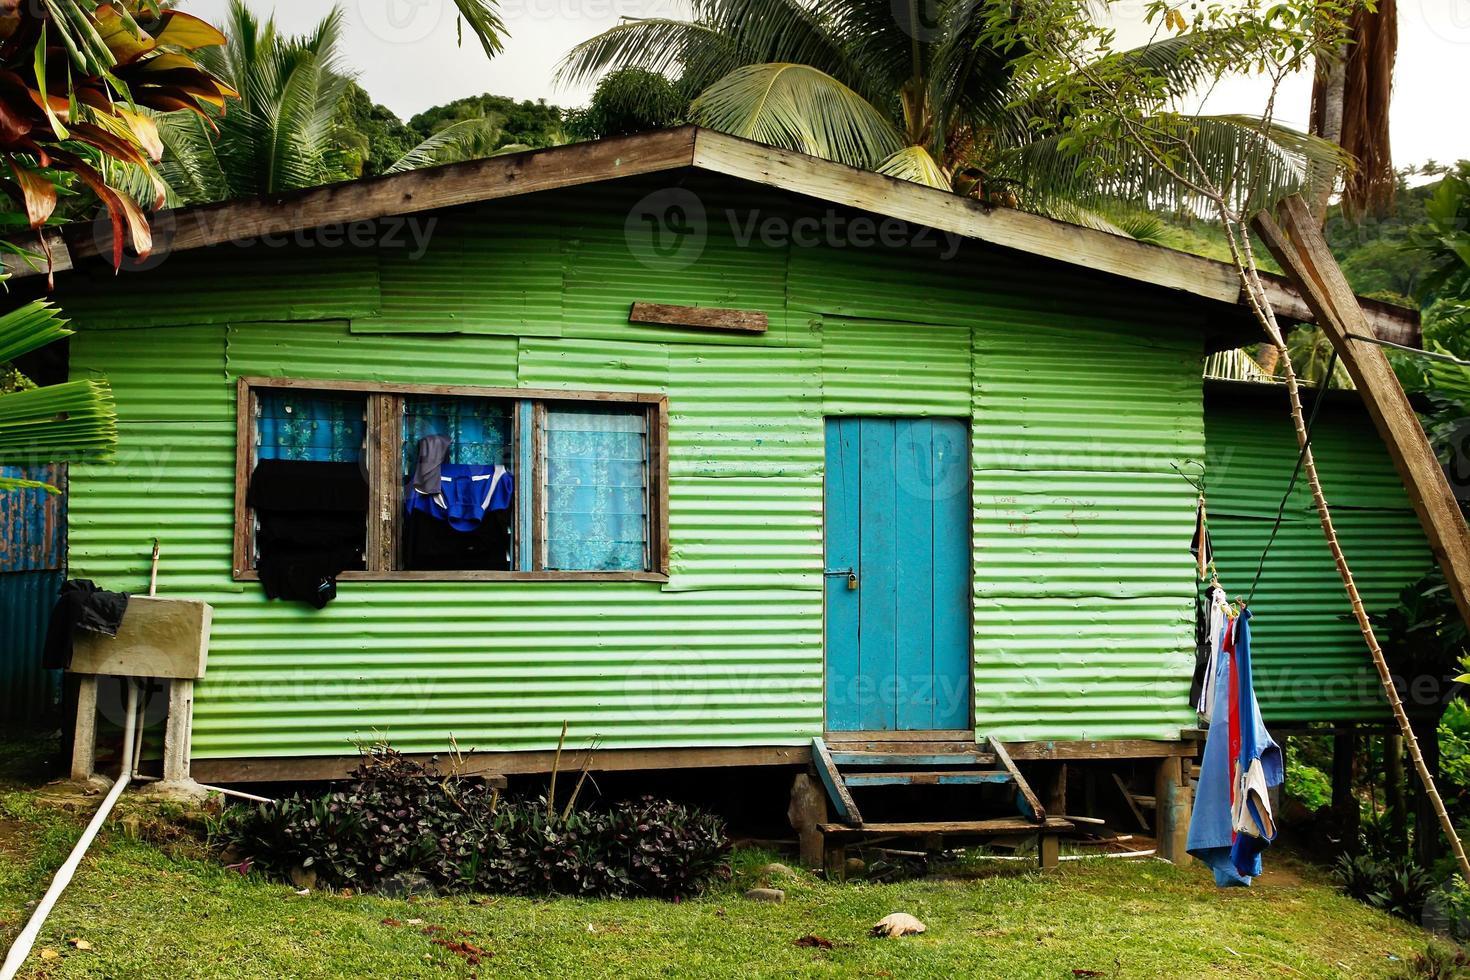 lokalt hus, Vanua Levu Island, Fiji foto